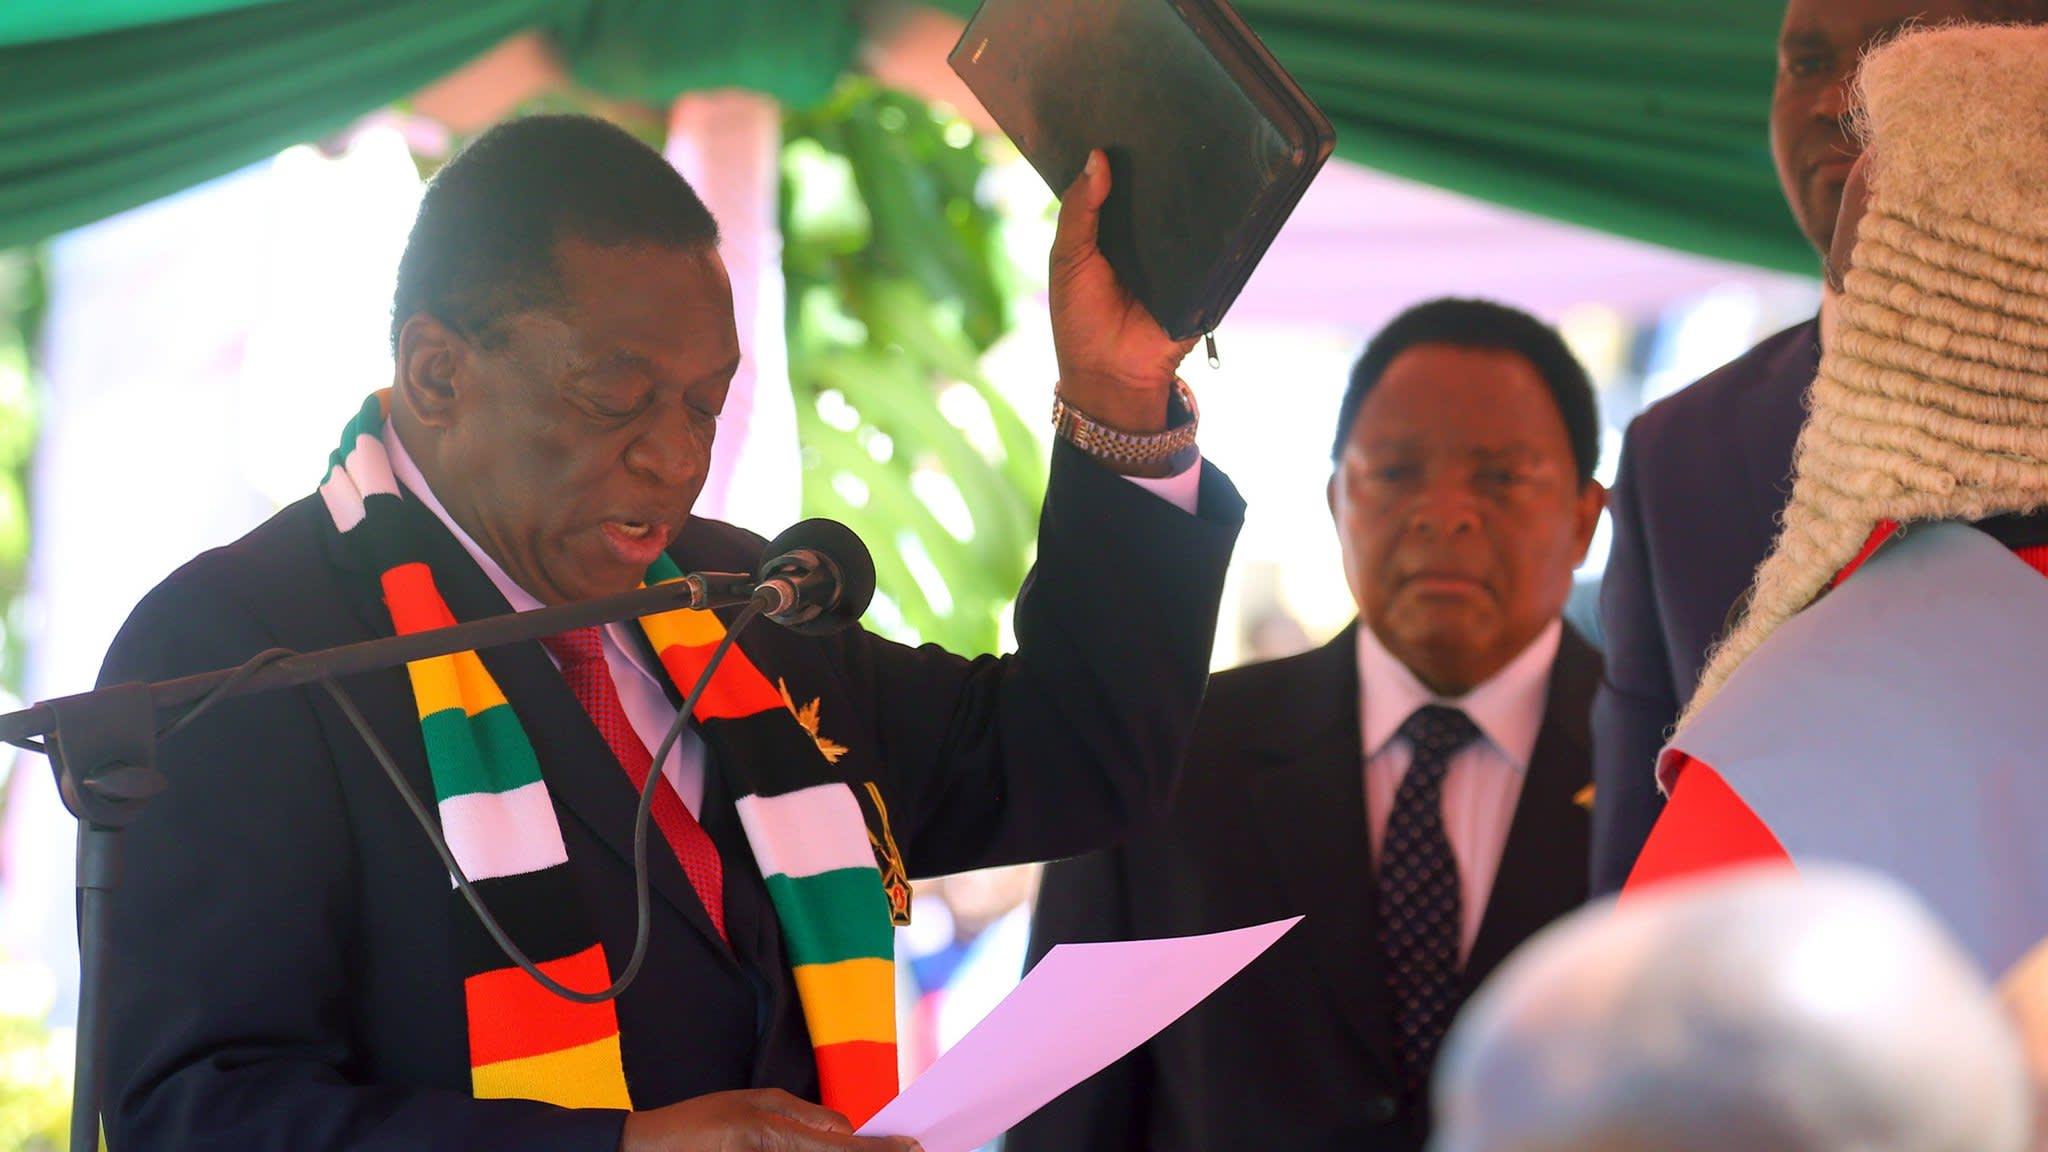 Mnangagwa pledges 'radical economic reforms' at inauguration